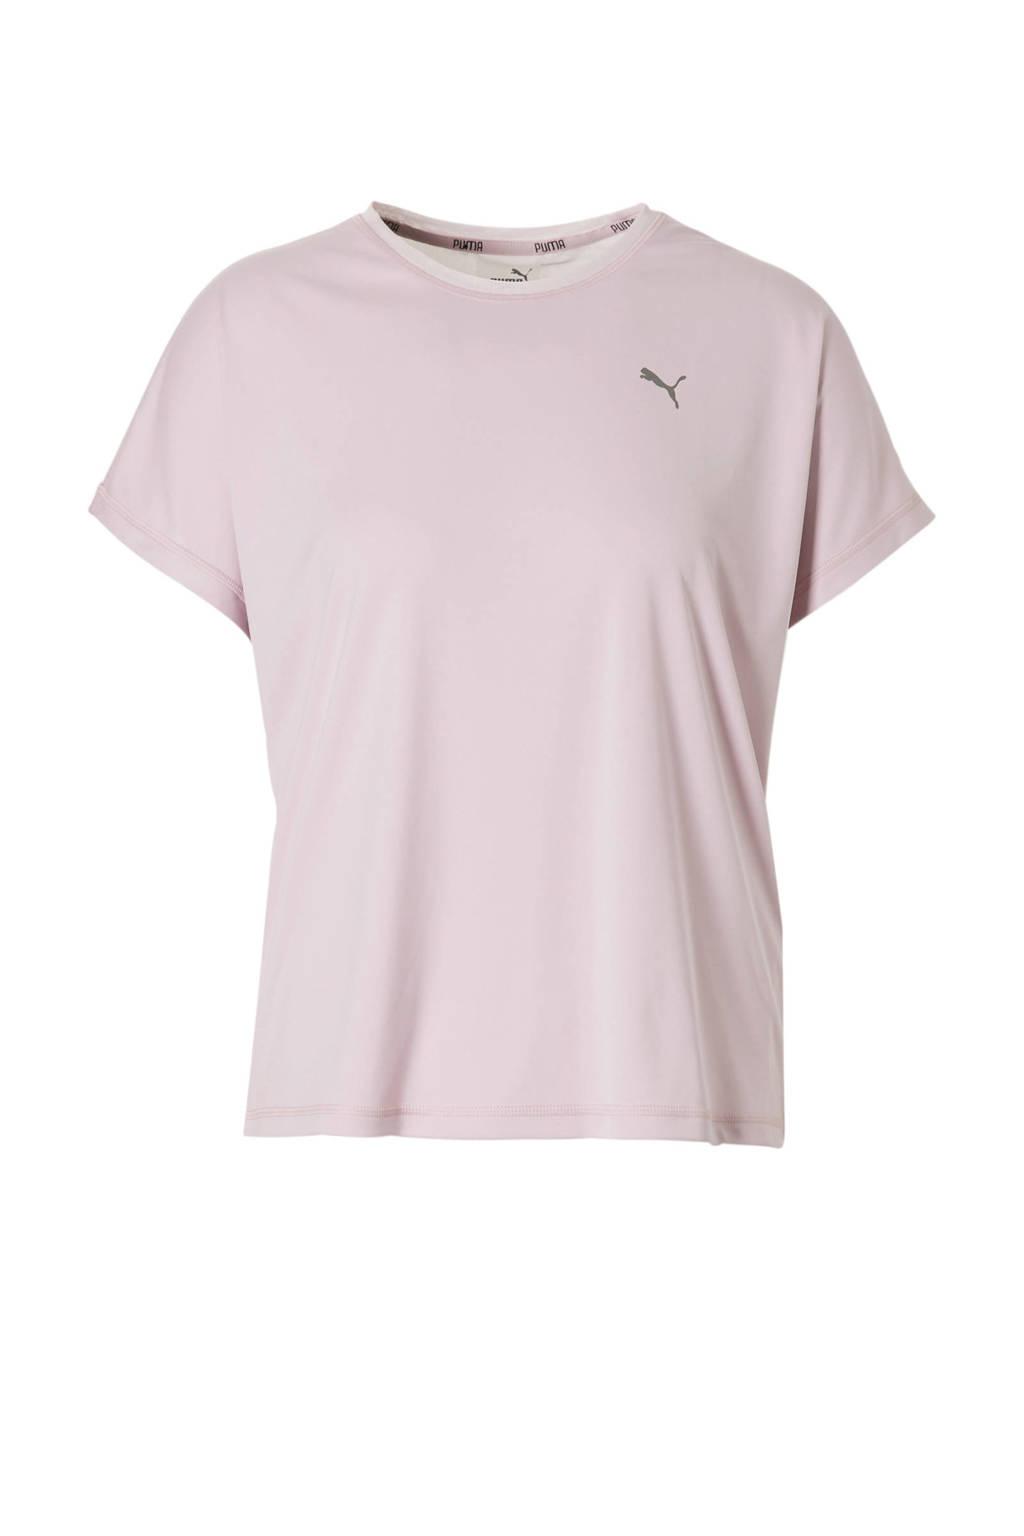 Puma sport T-shirt roze, Roze